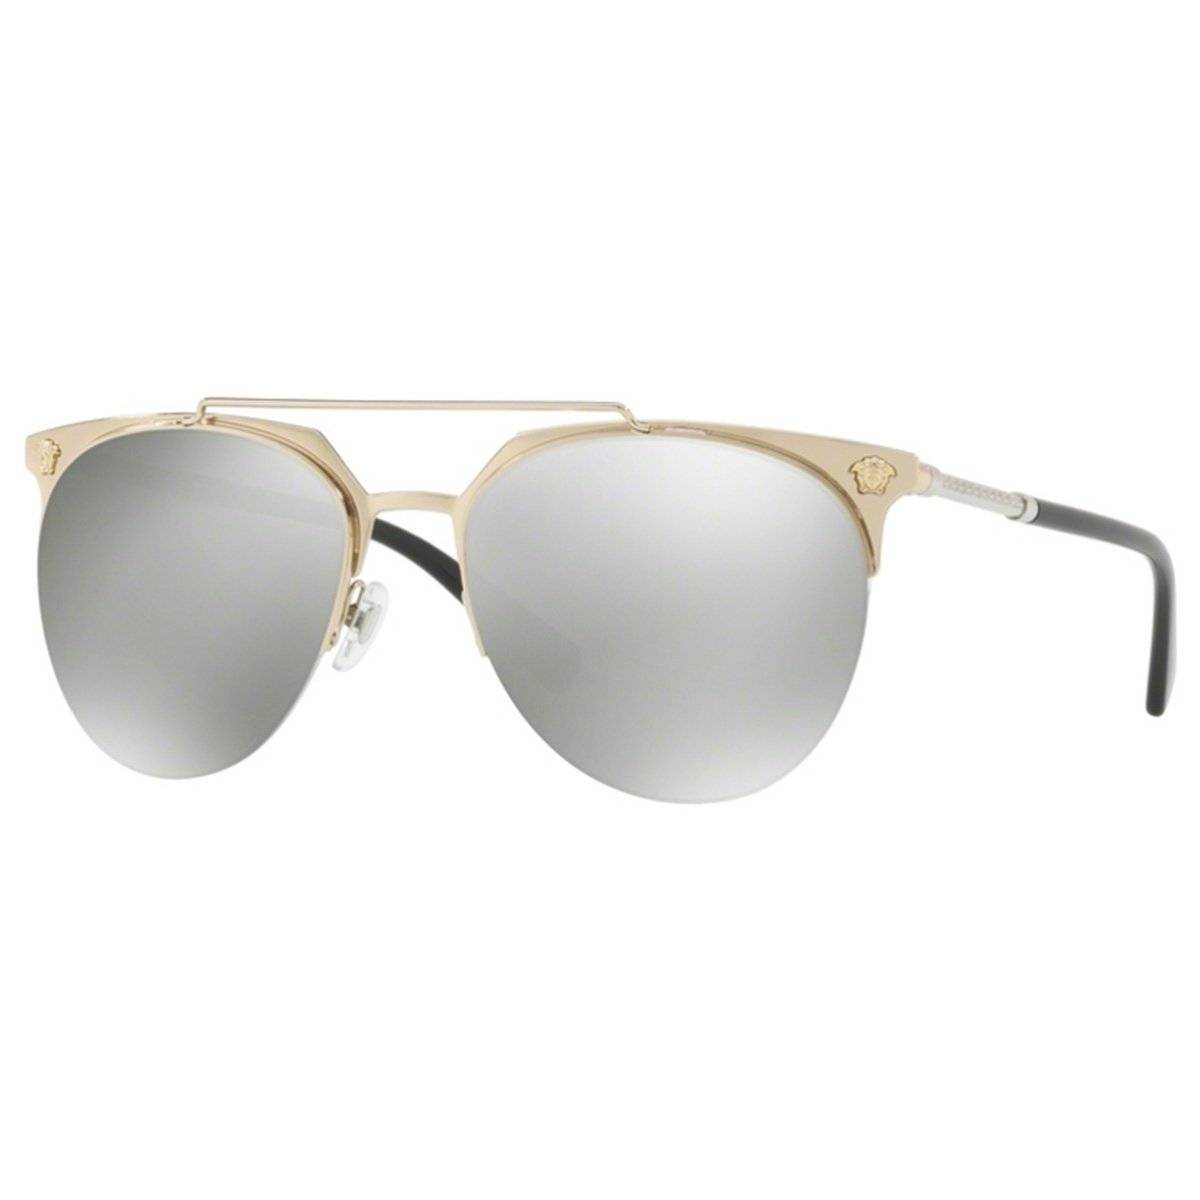 Compre Óculos de Sol Versace em 10X   Tri-Jóia Shop 9671737872